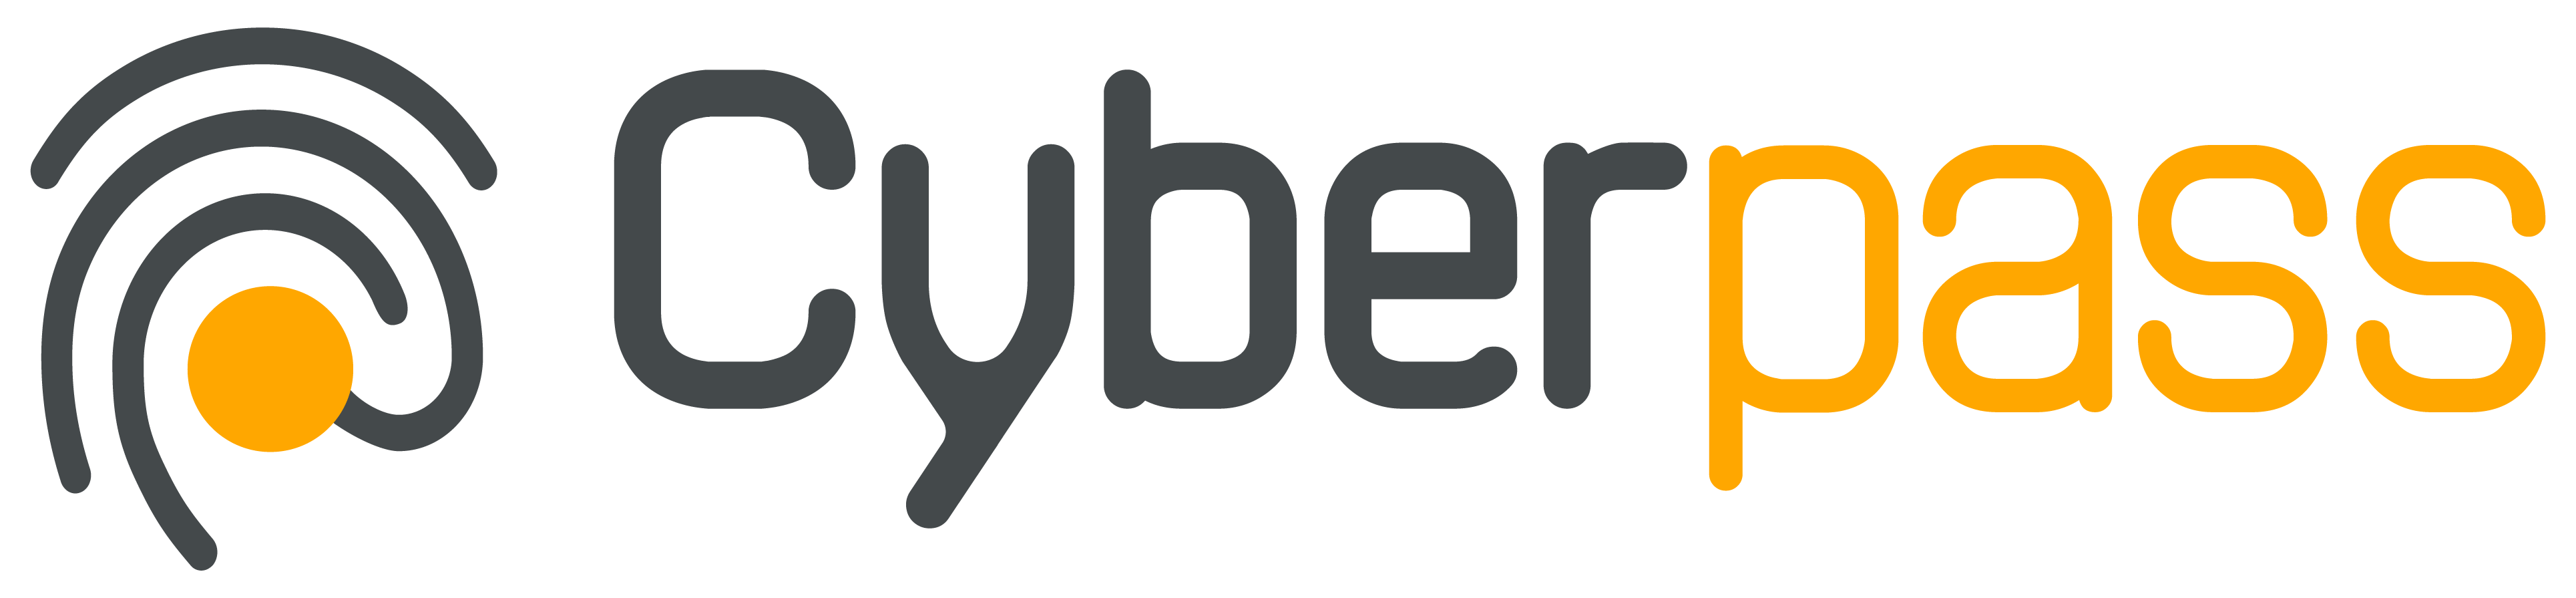 Cyberpass